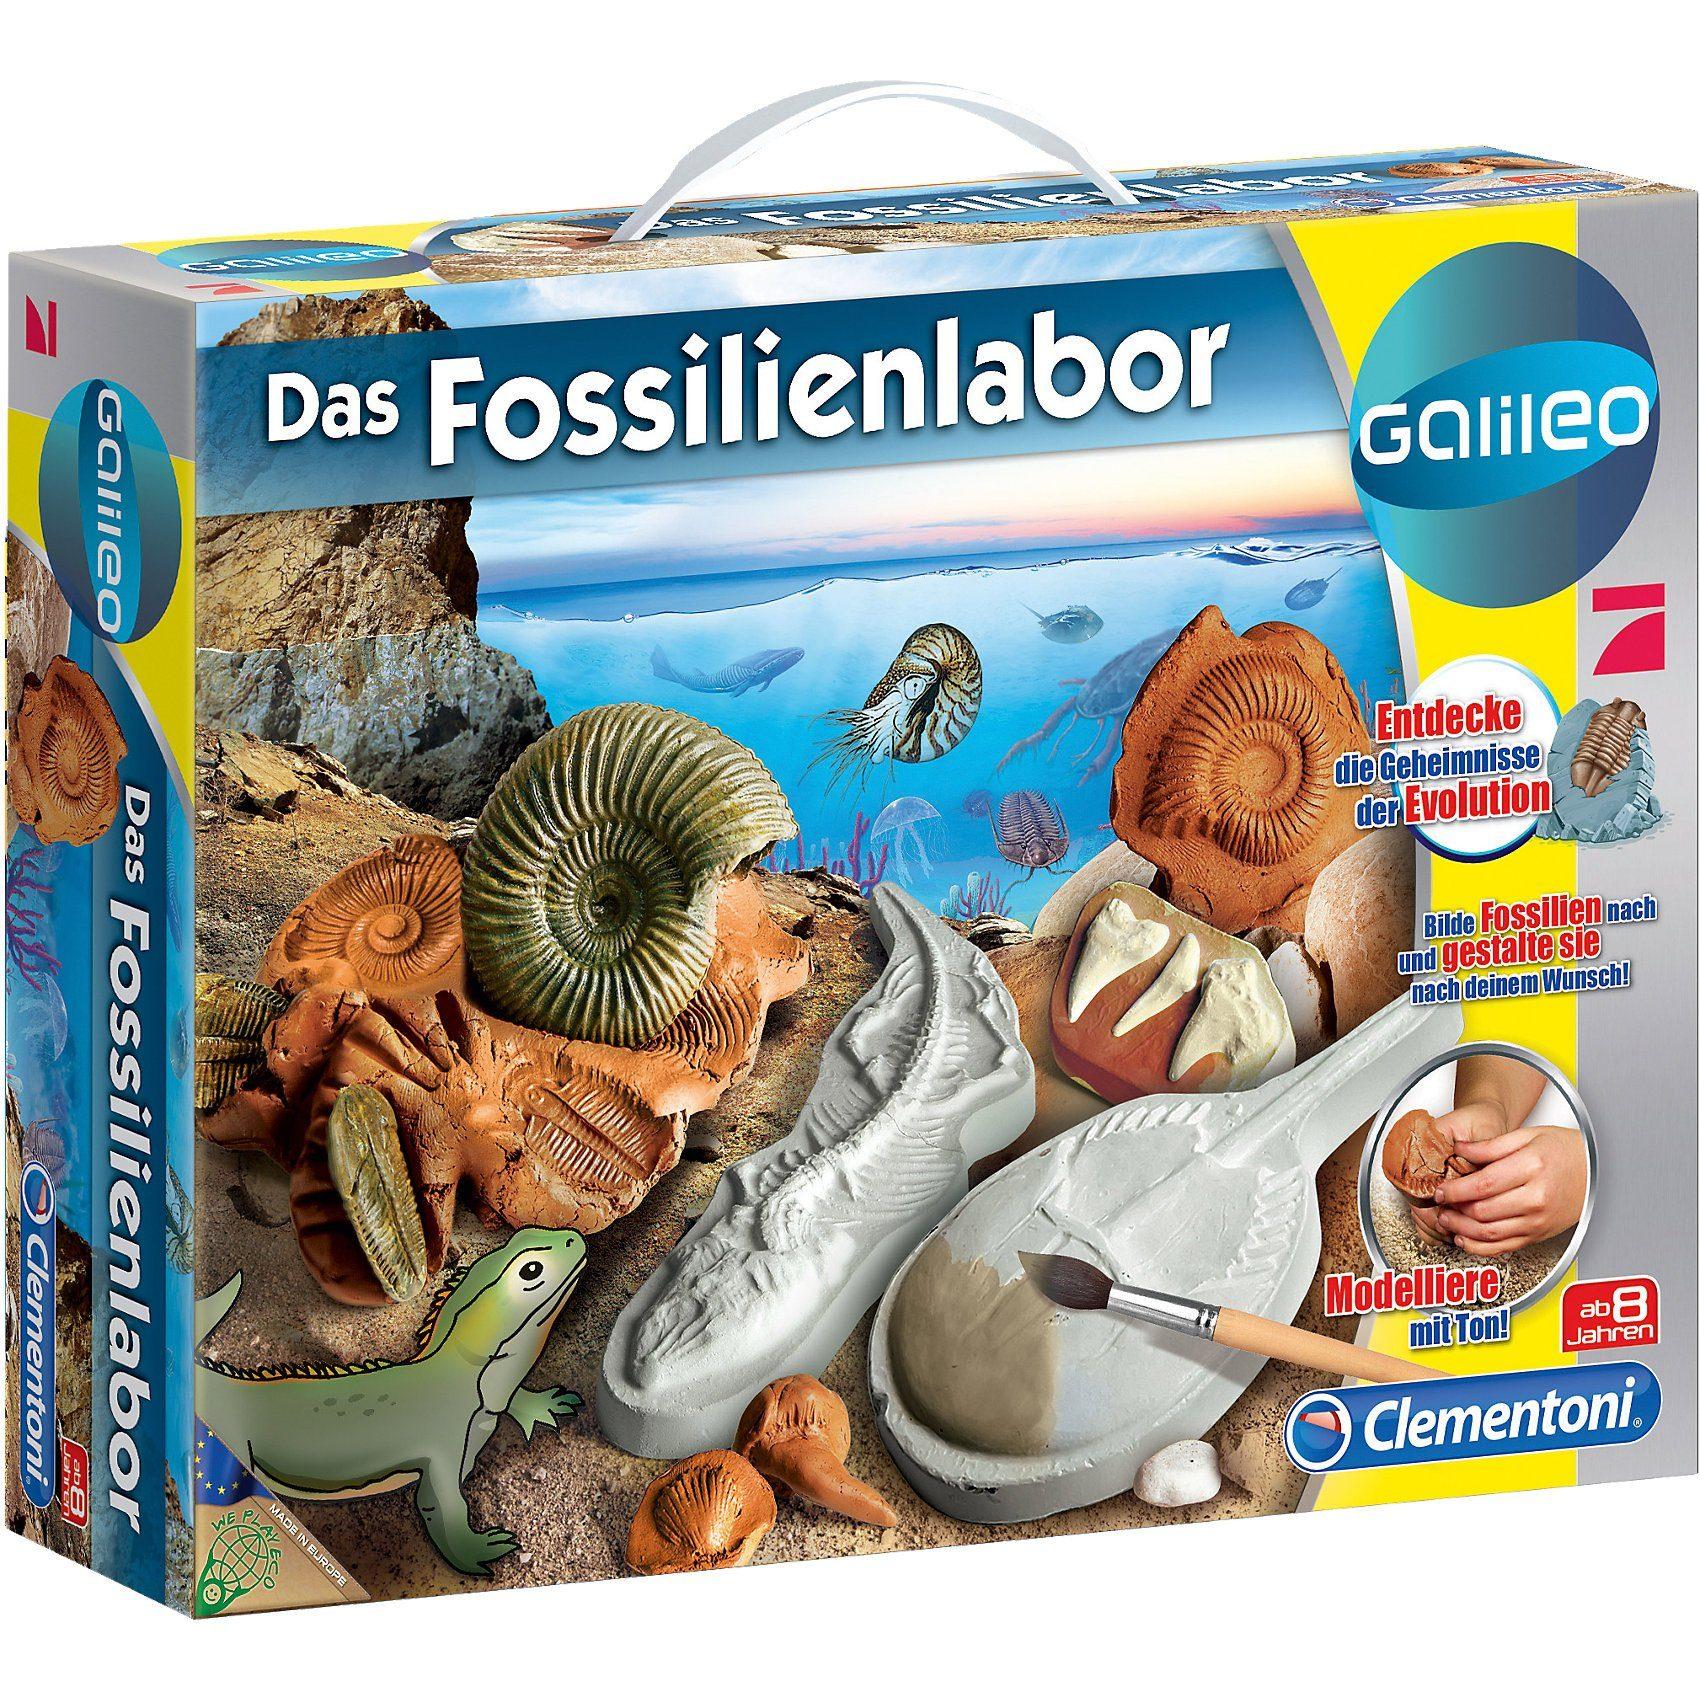 Clementoni® Galileo - Das Fossilienlabor